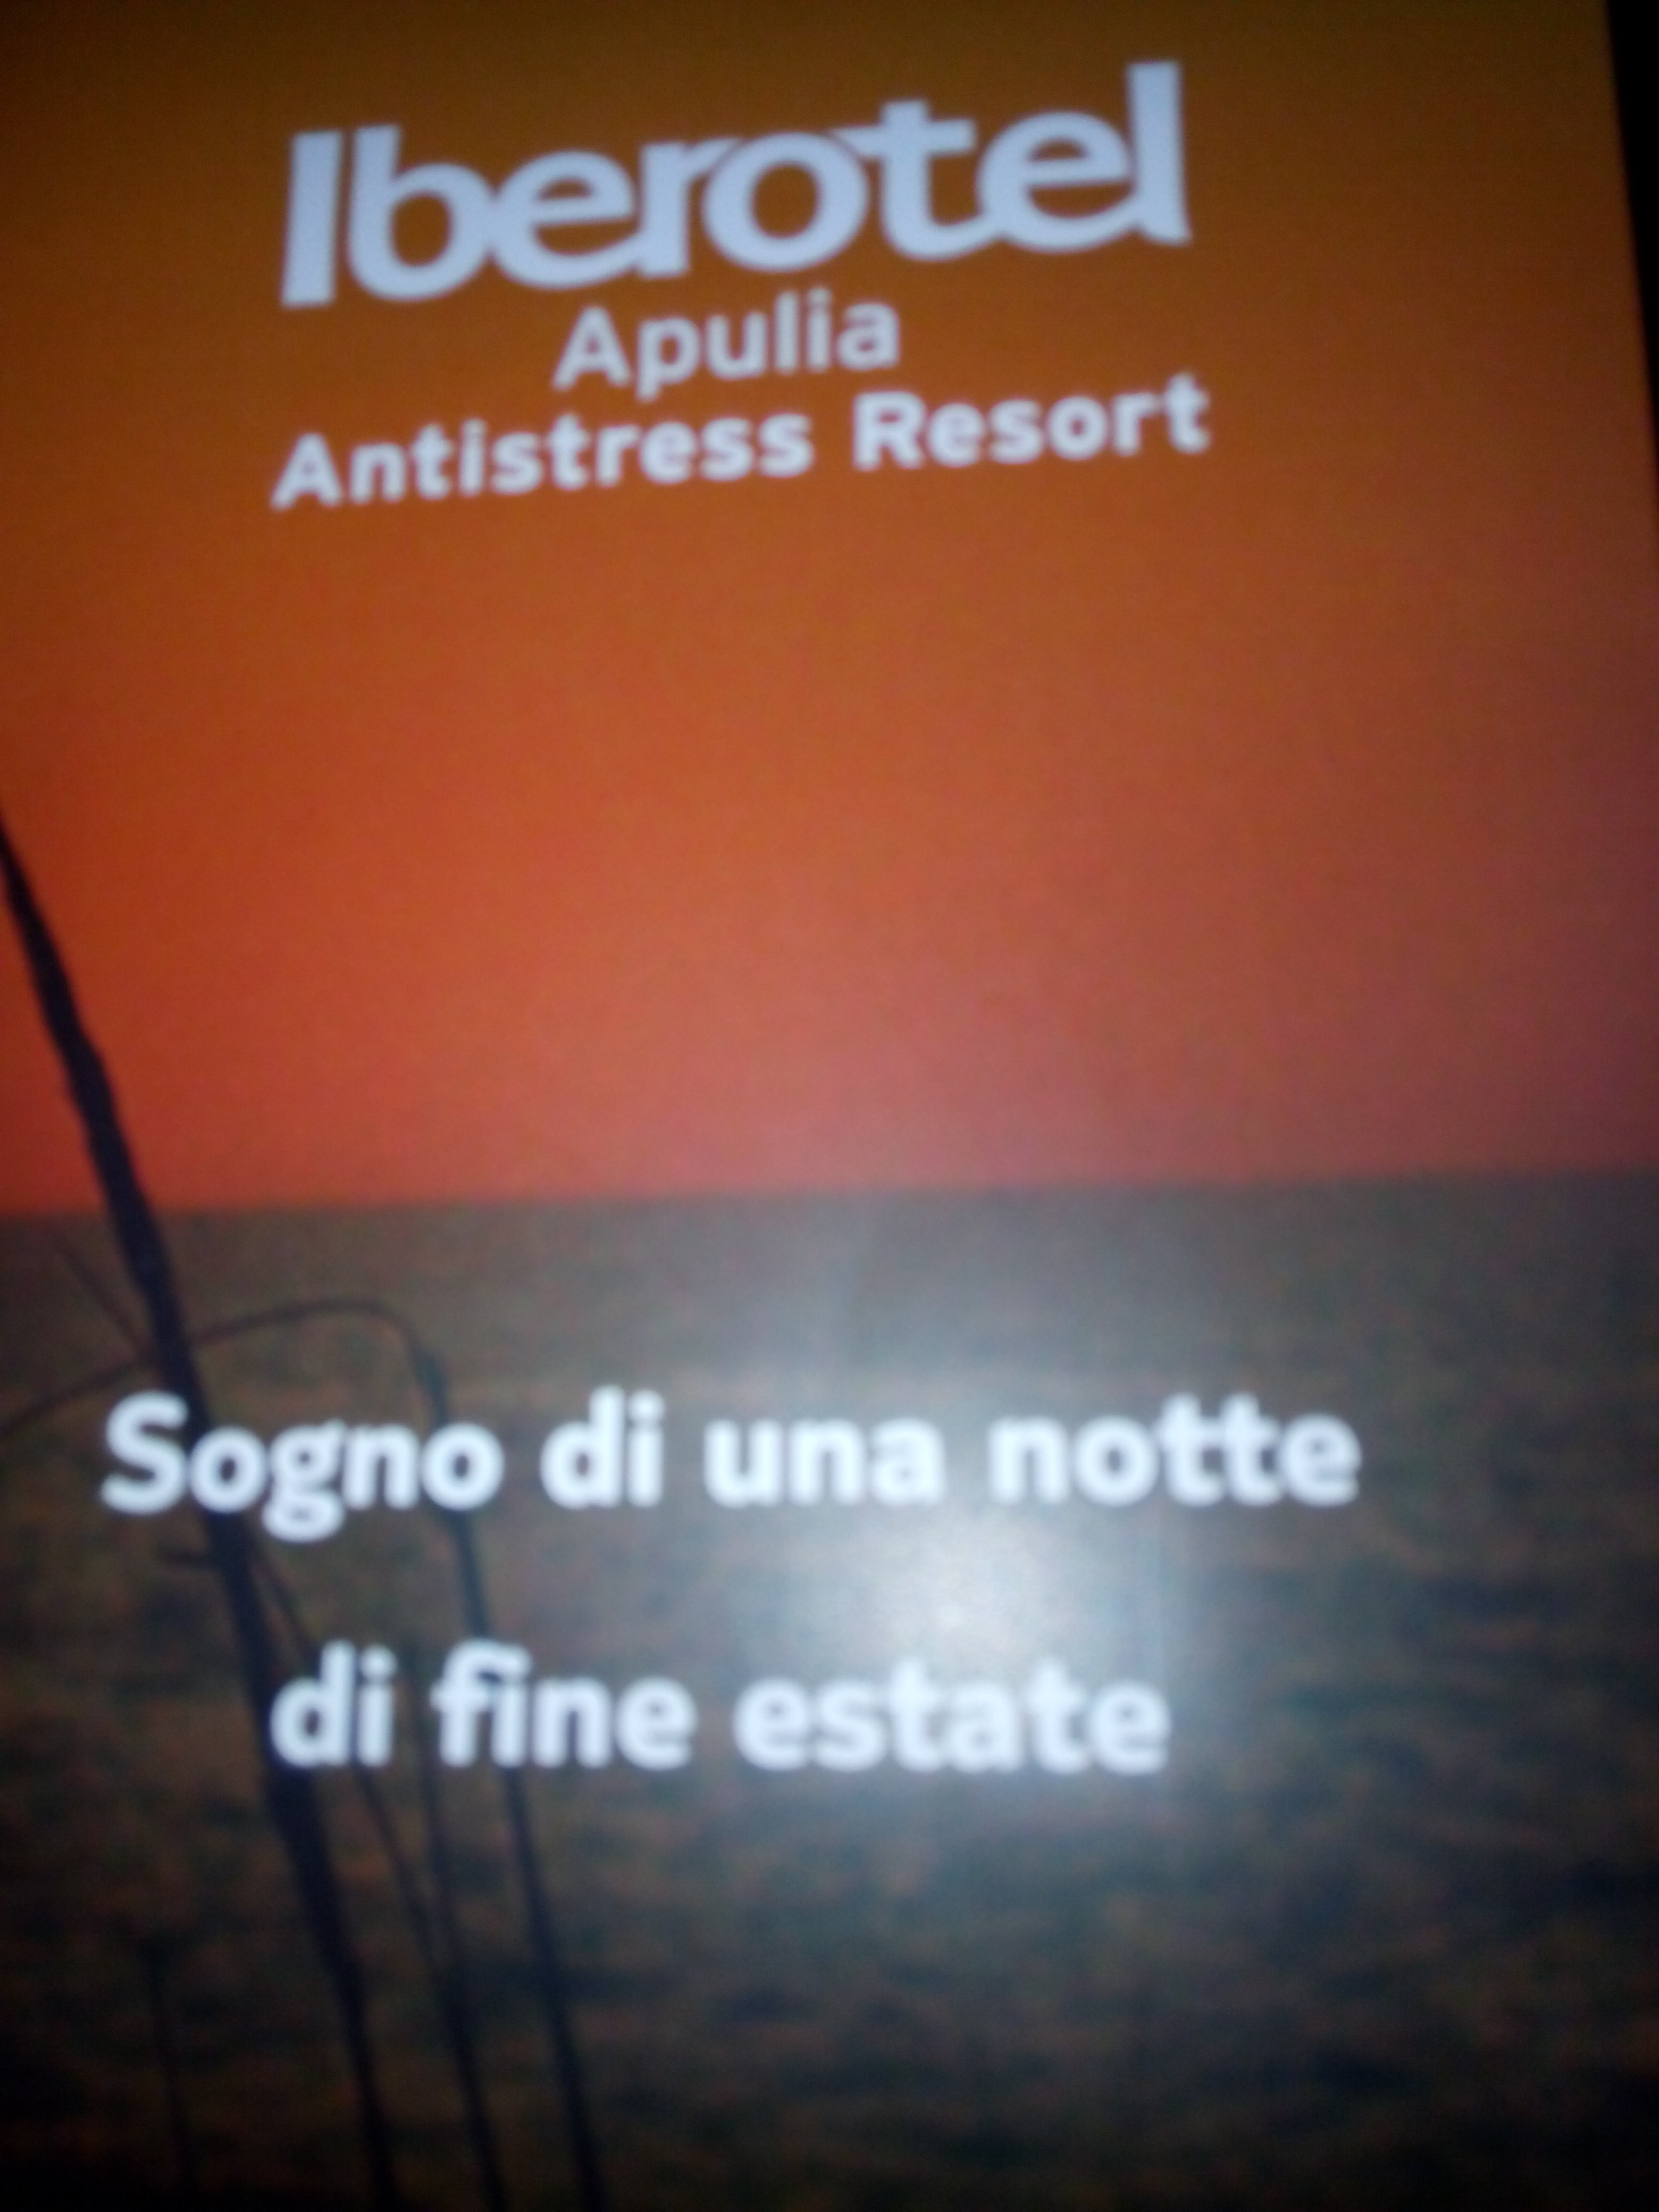 Seminario esperienziale di Mirco Turco presso Iberotel Apulia, Ugento – Antistress Academy projectM